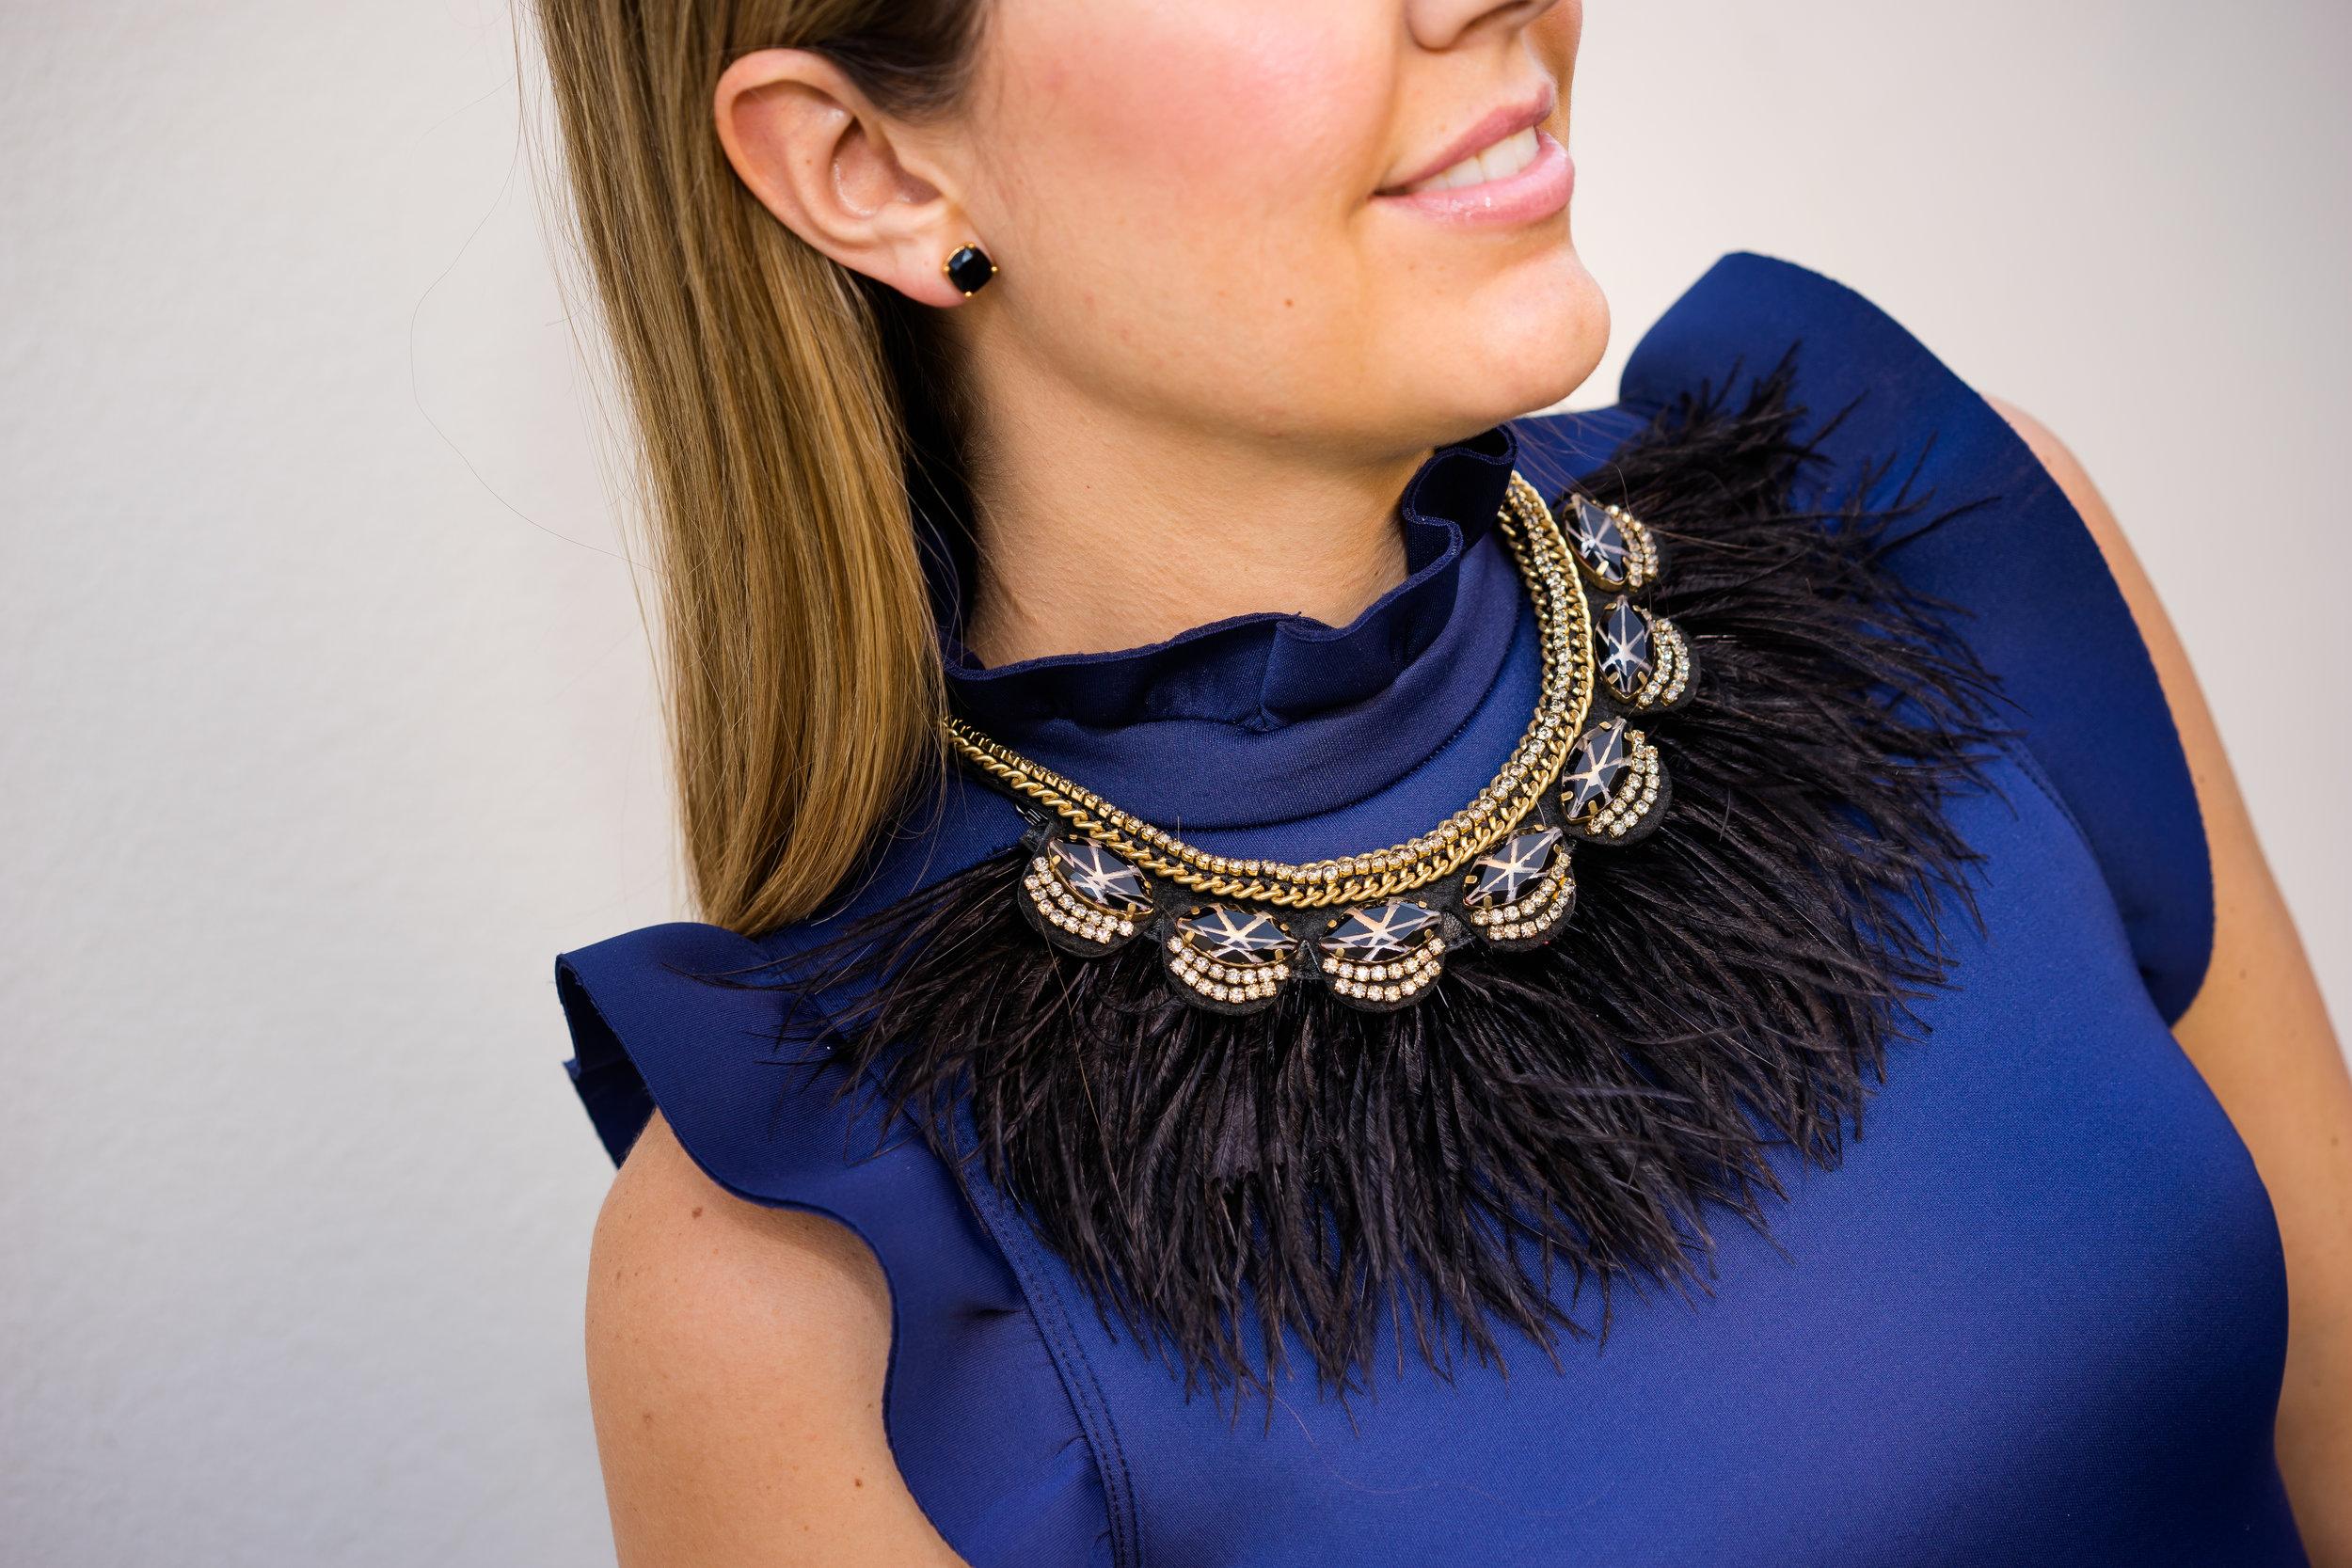 Navy dress, black feather necklace